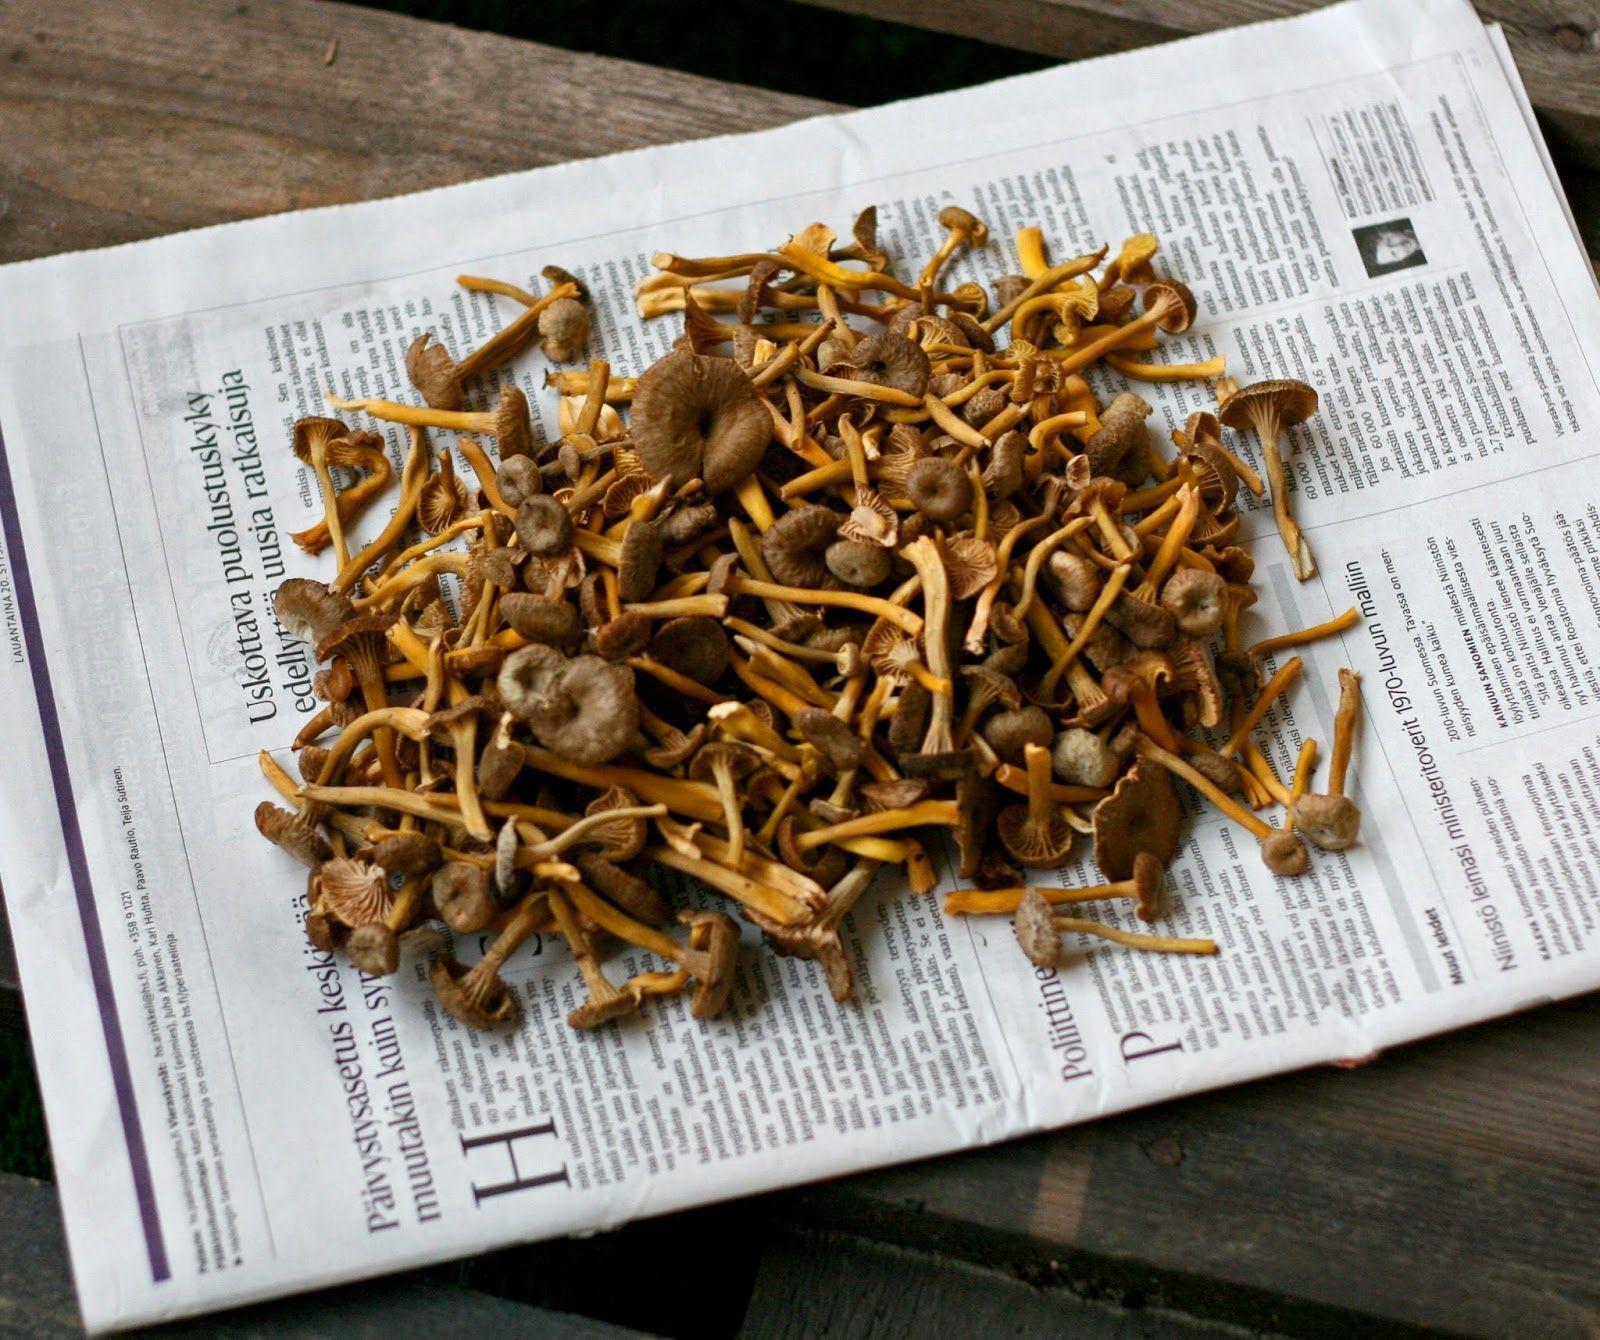 Results of the mushroom foraging: Craterellus tubaeformis =Yellowfoot = Winter mushroom = Funnel Chanterelle = suppilovahvero